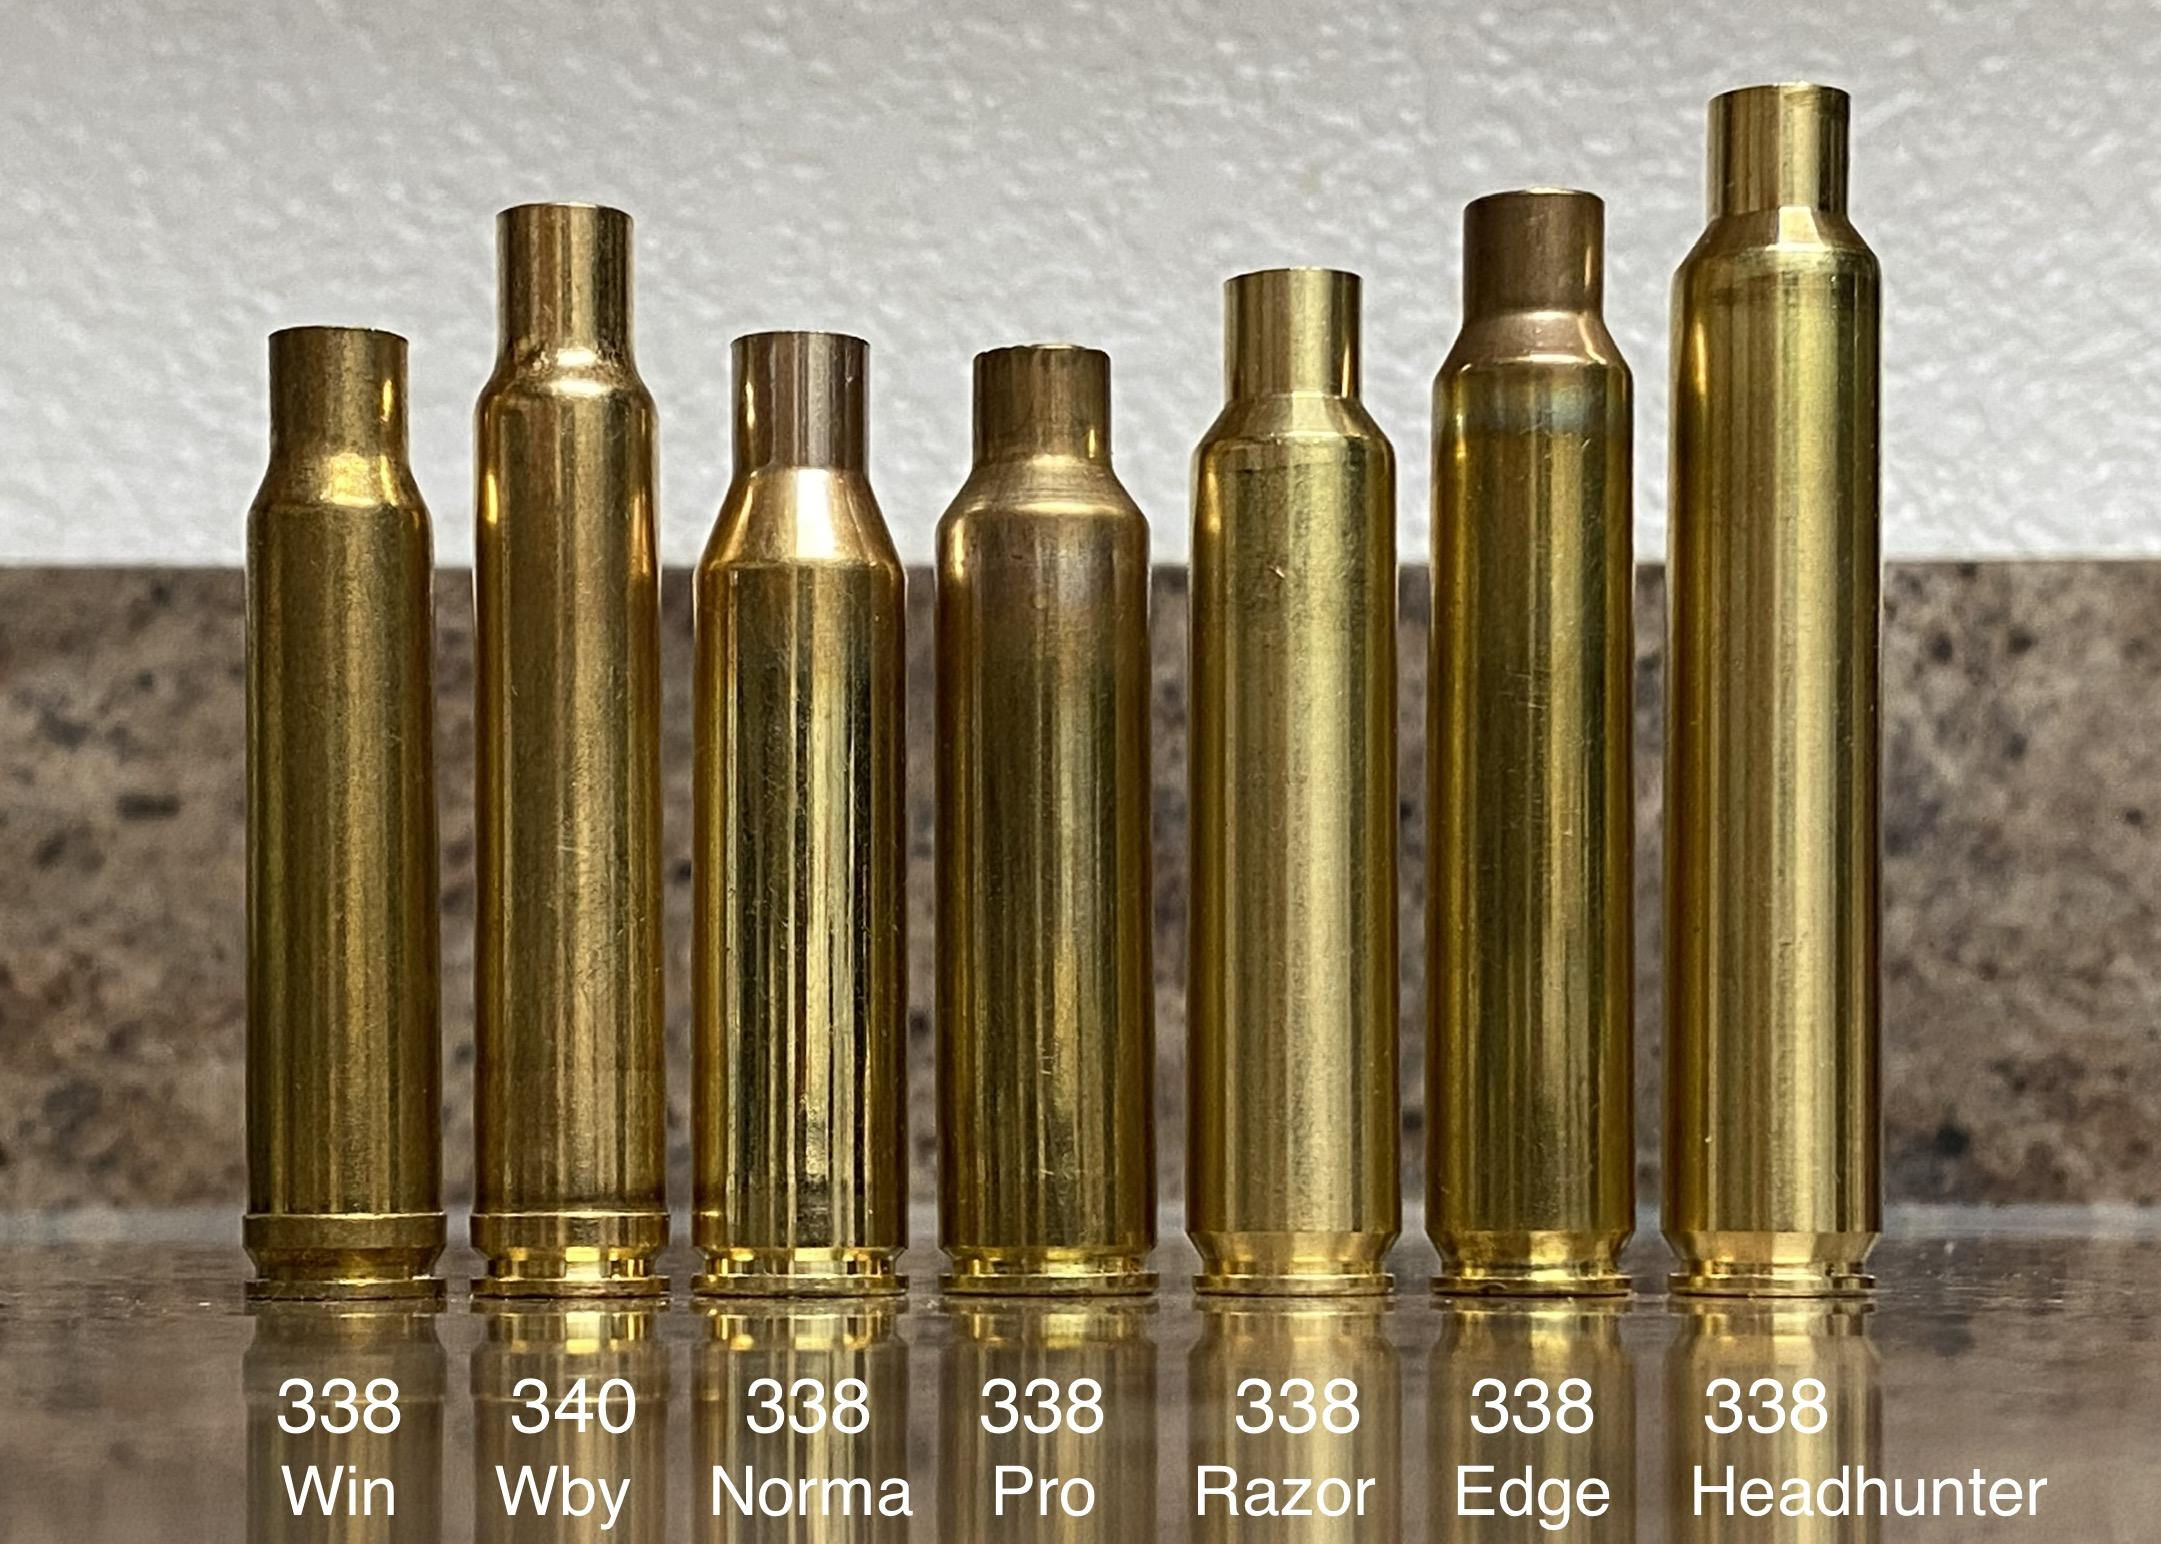 D8B5CC49-AC03-4CE0-A6A9-9A9E38EAC4E6.jpeg